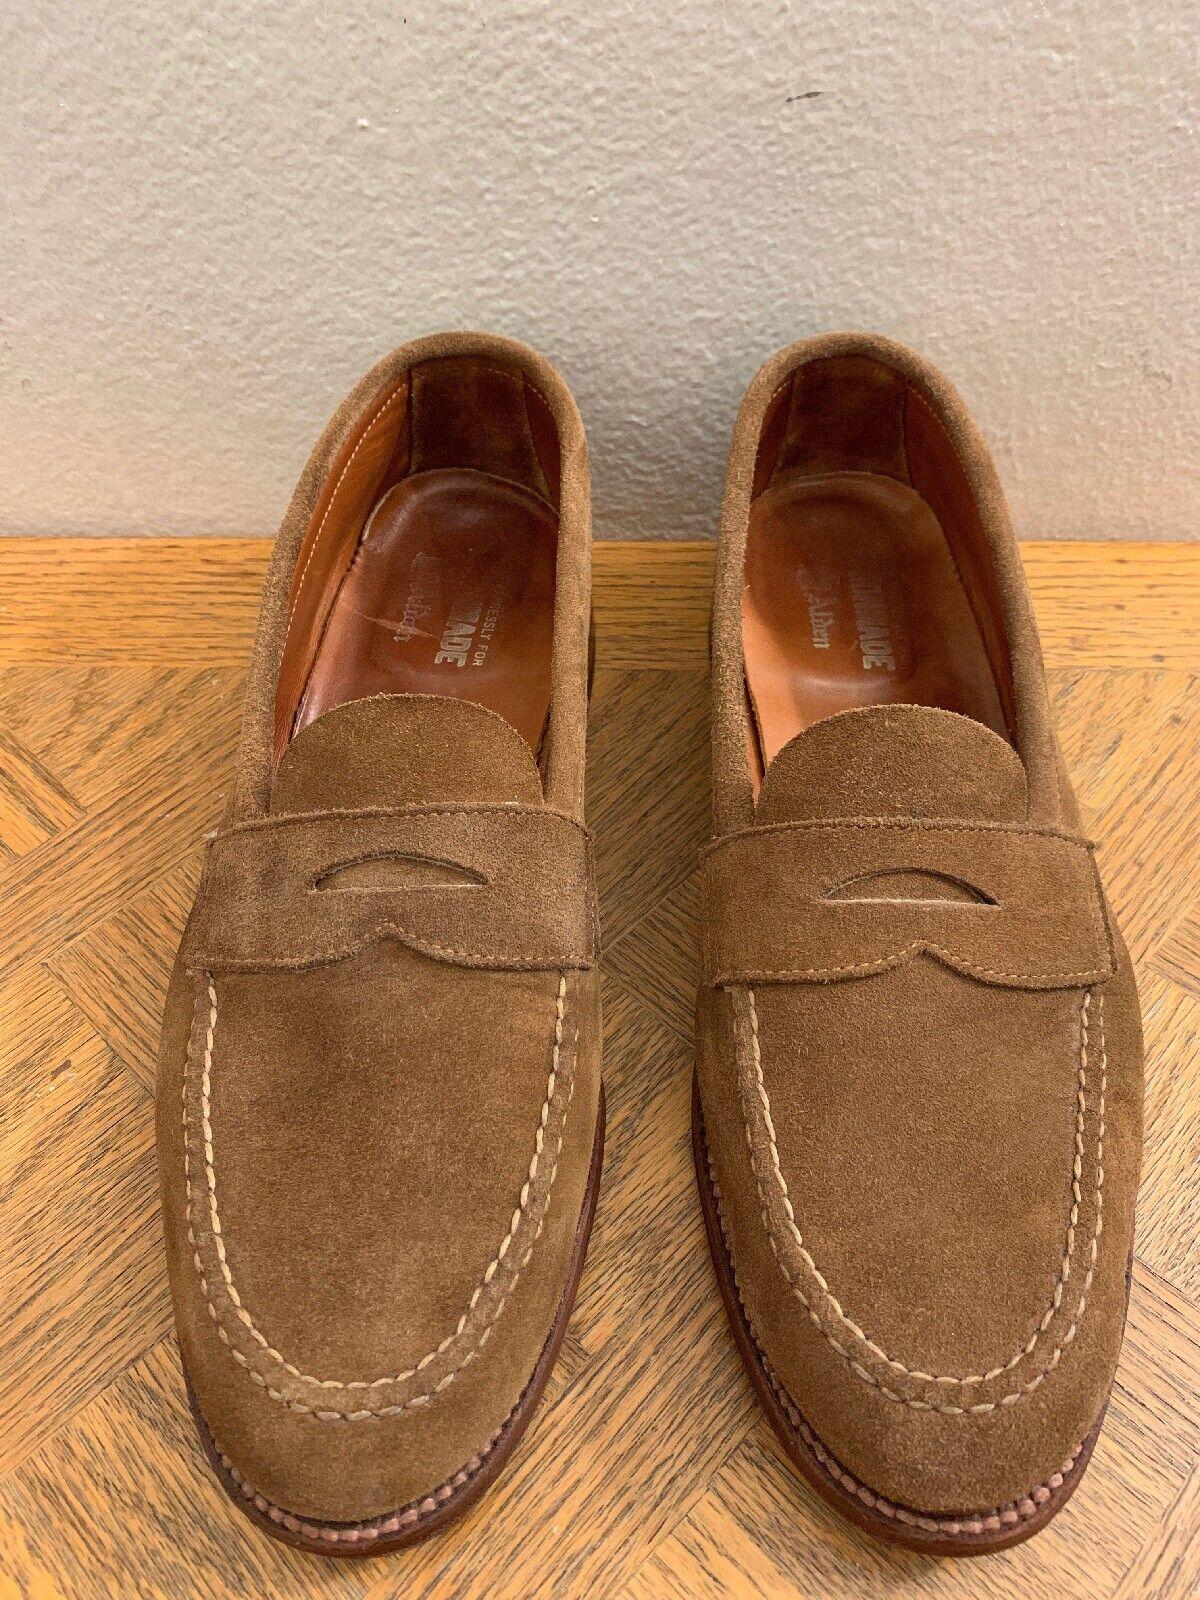 Alden Snuff Suede X Unionmade Loafers Men's Größe 11 B D 62437